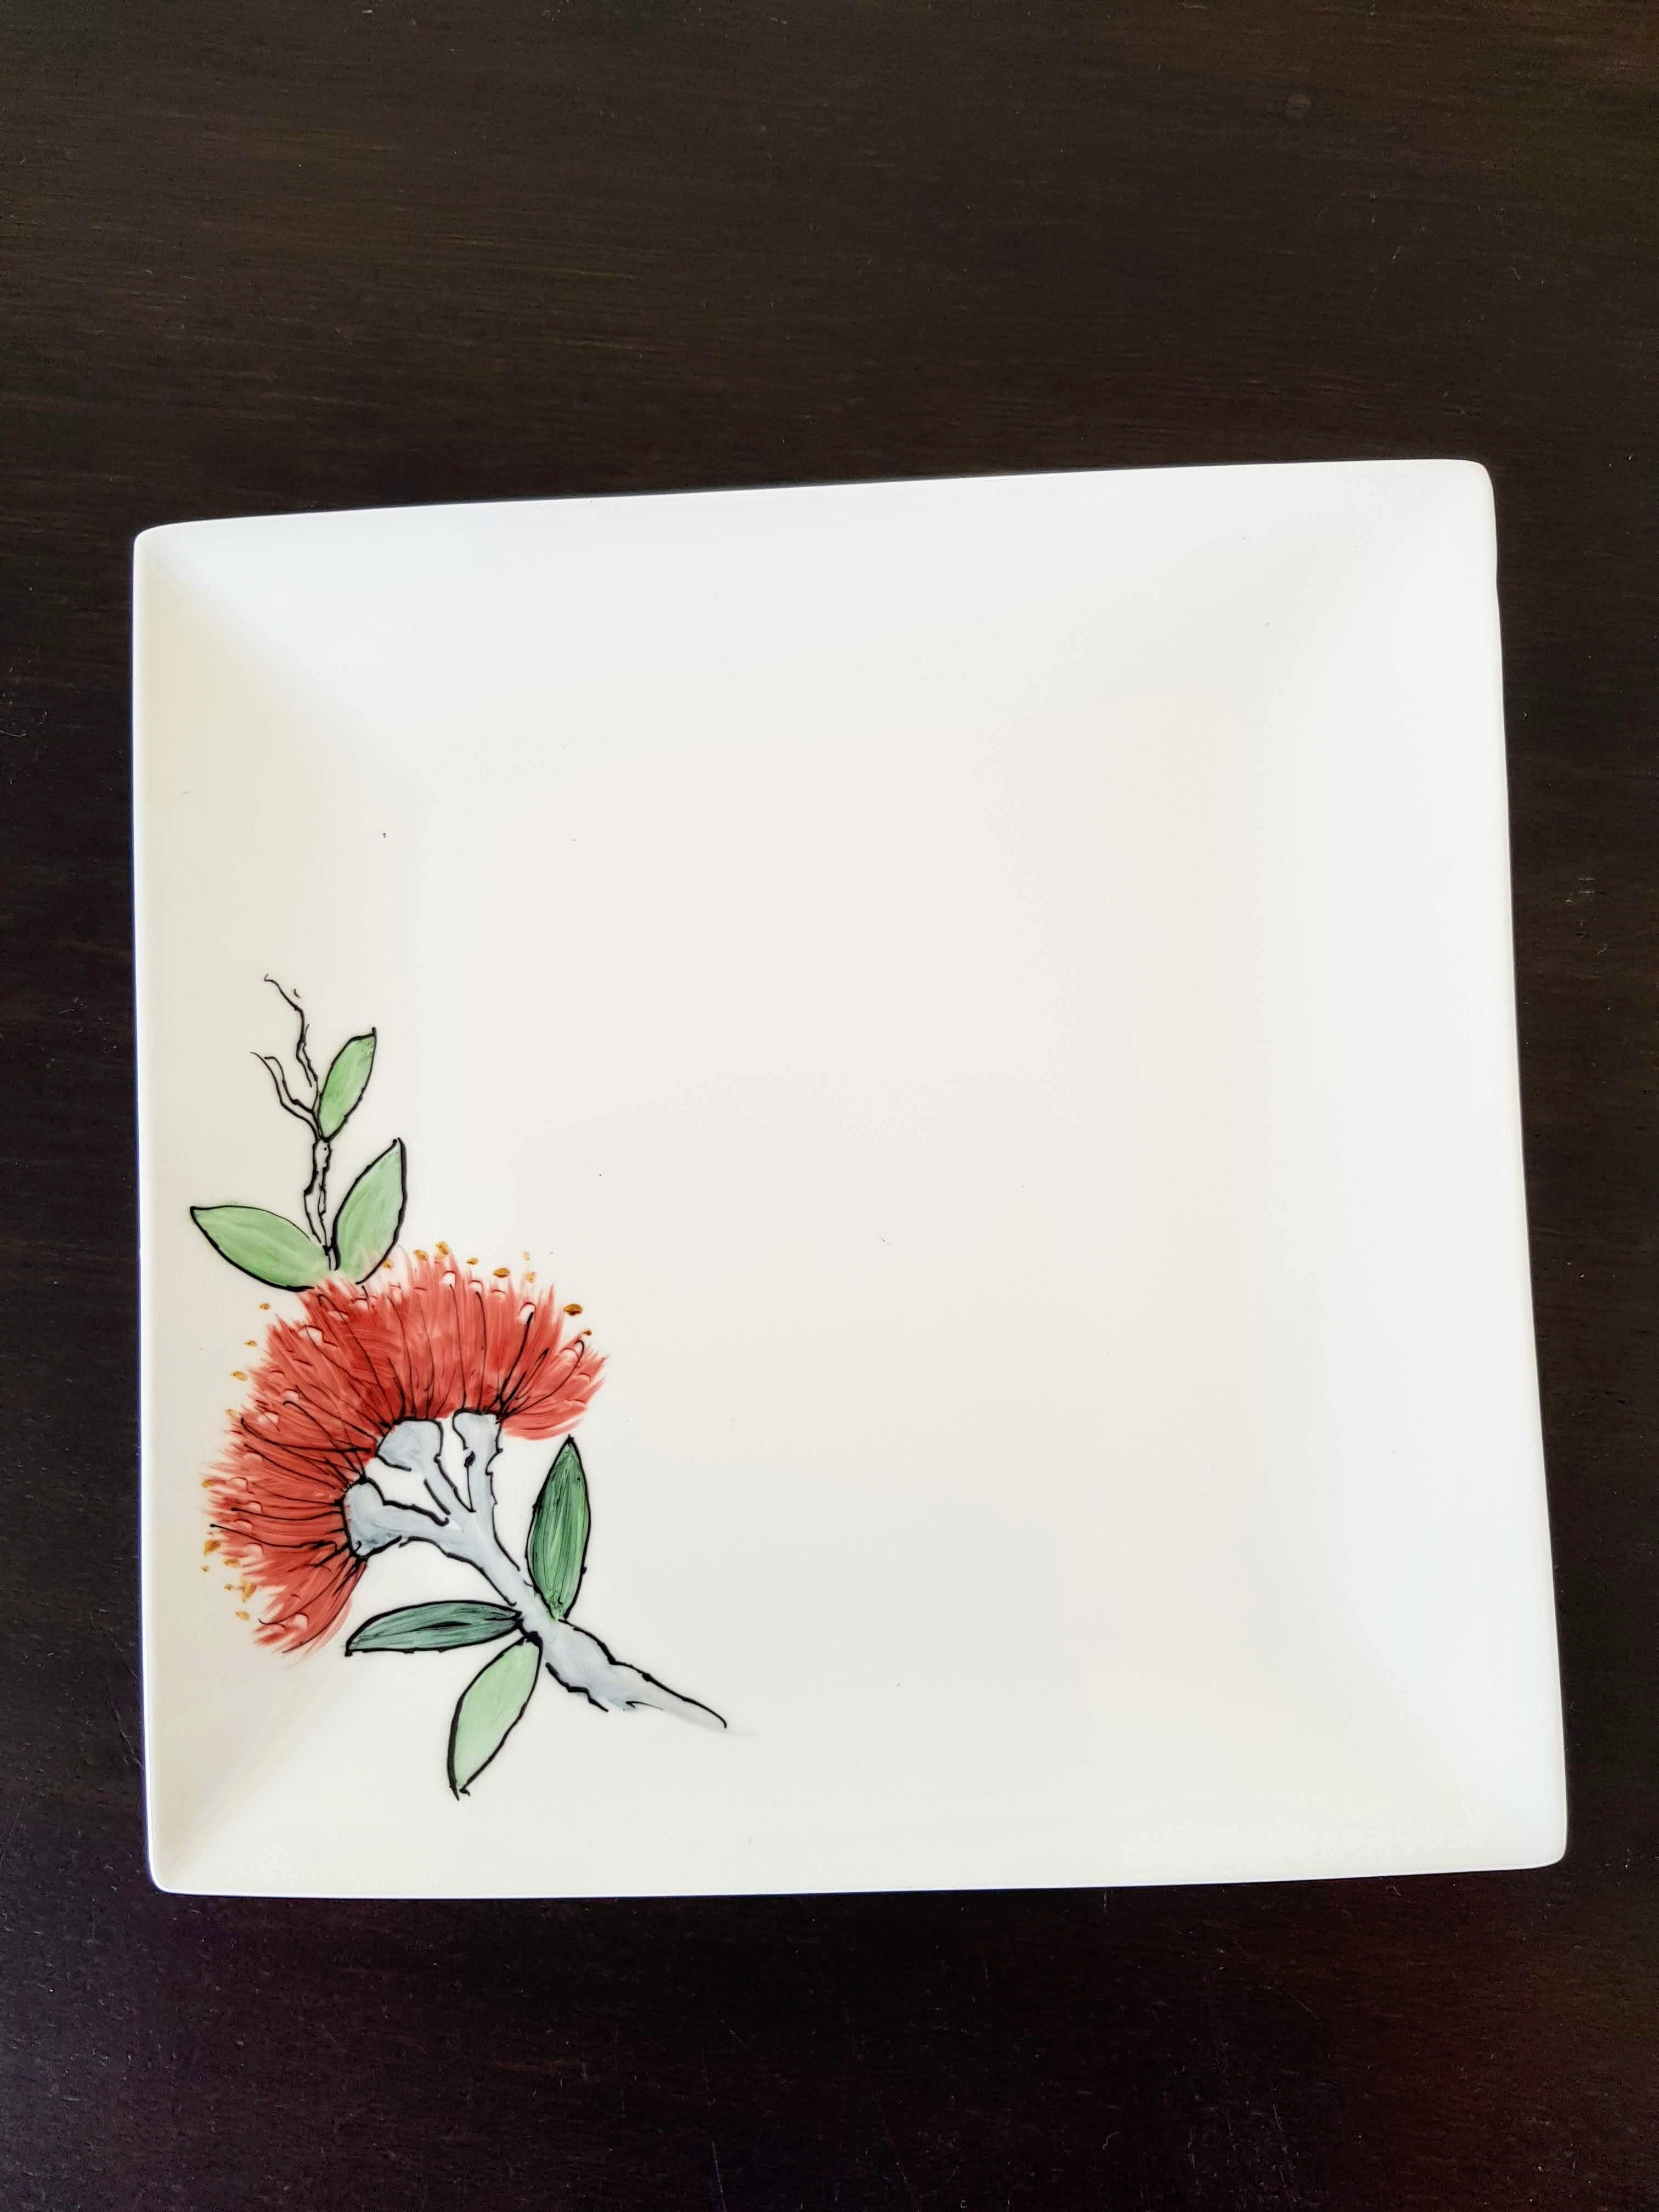 Square plate on dark